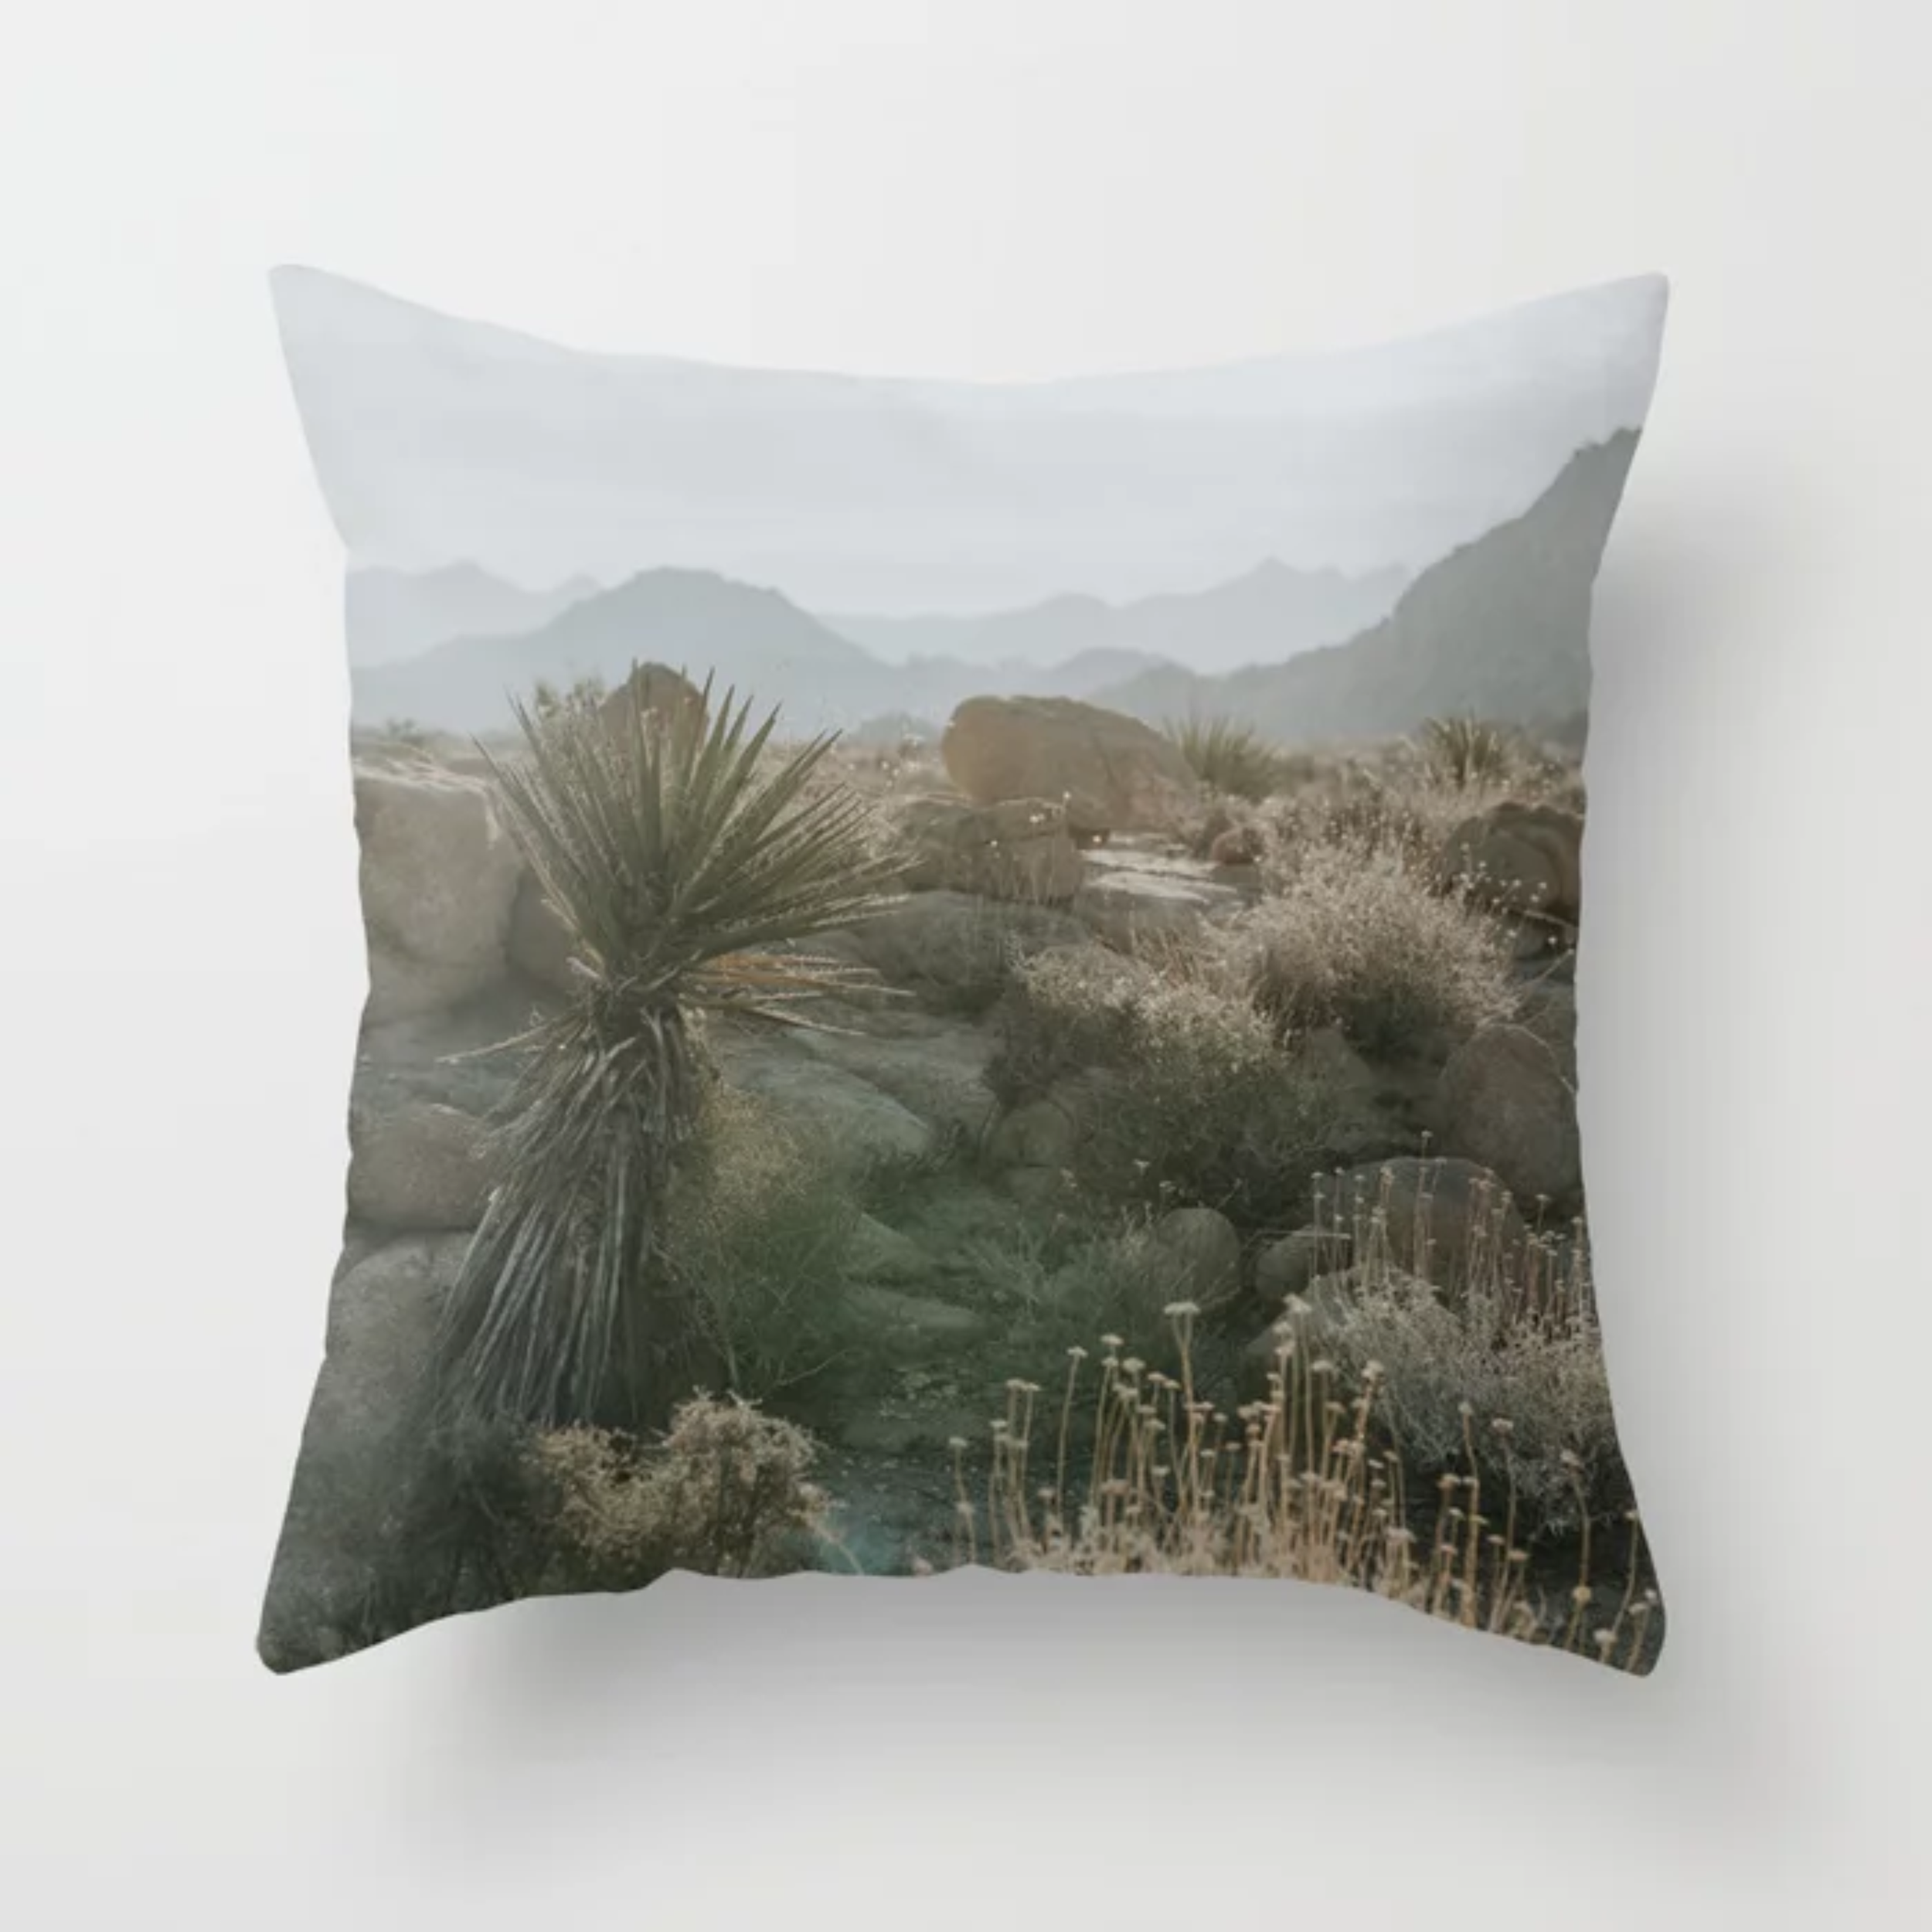 cushion 2.png